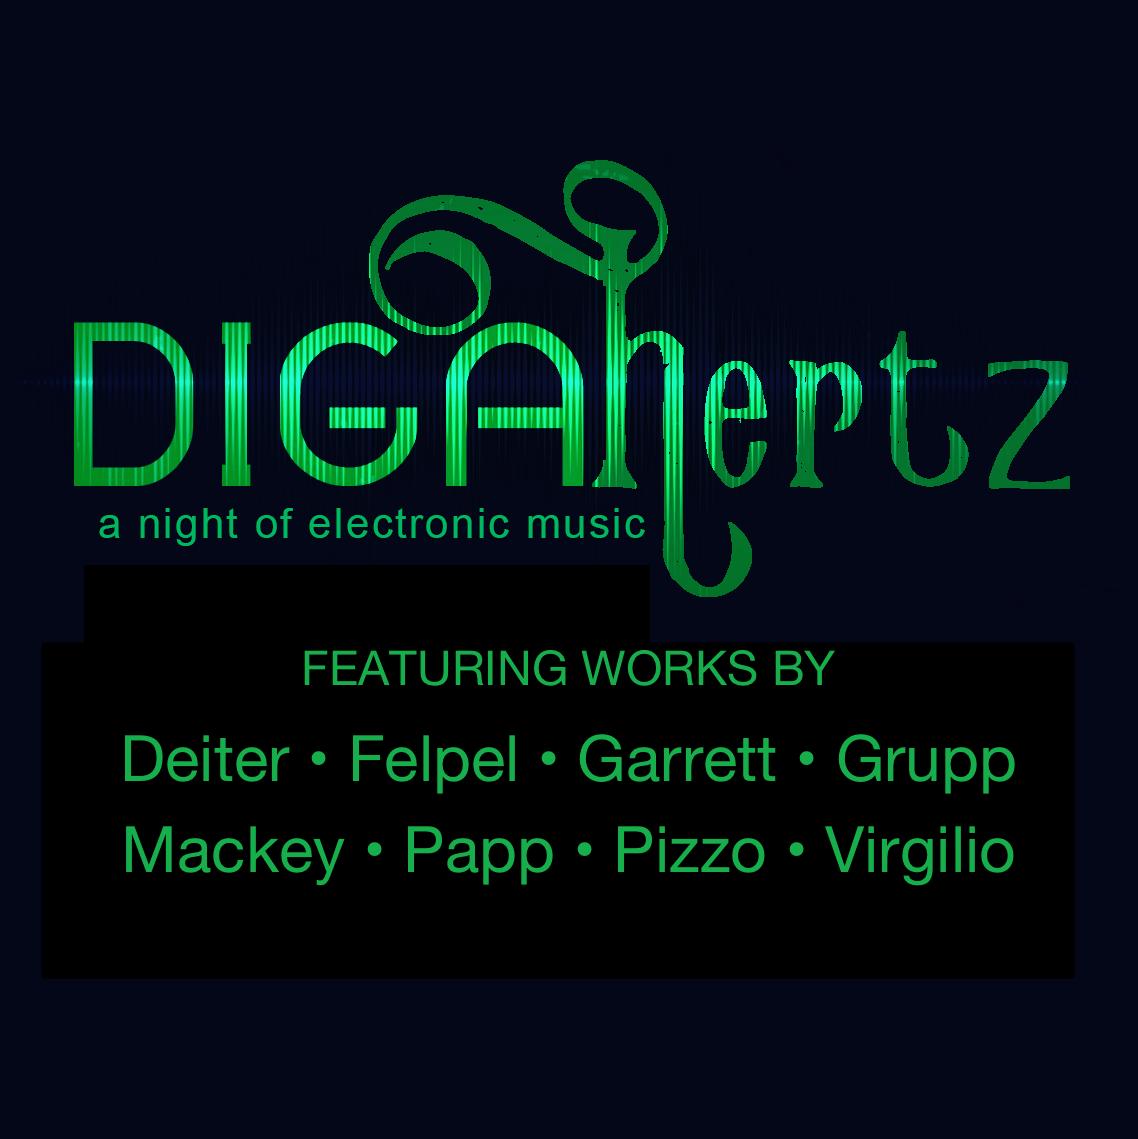 DIGAhertz featuring works by Deiter Felpel Garrett Grupp Mackey Papp Pizzo Virgilio